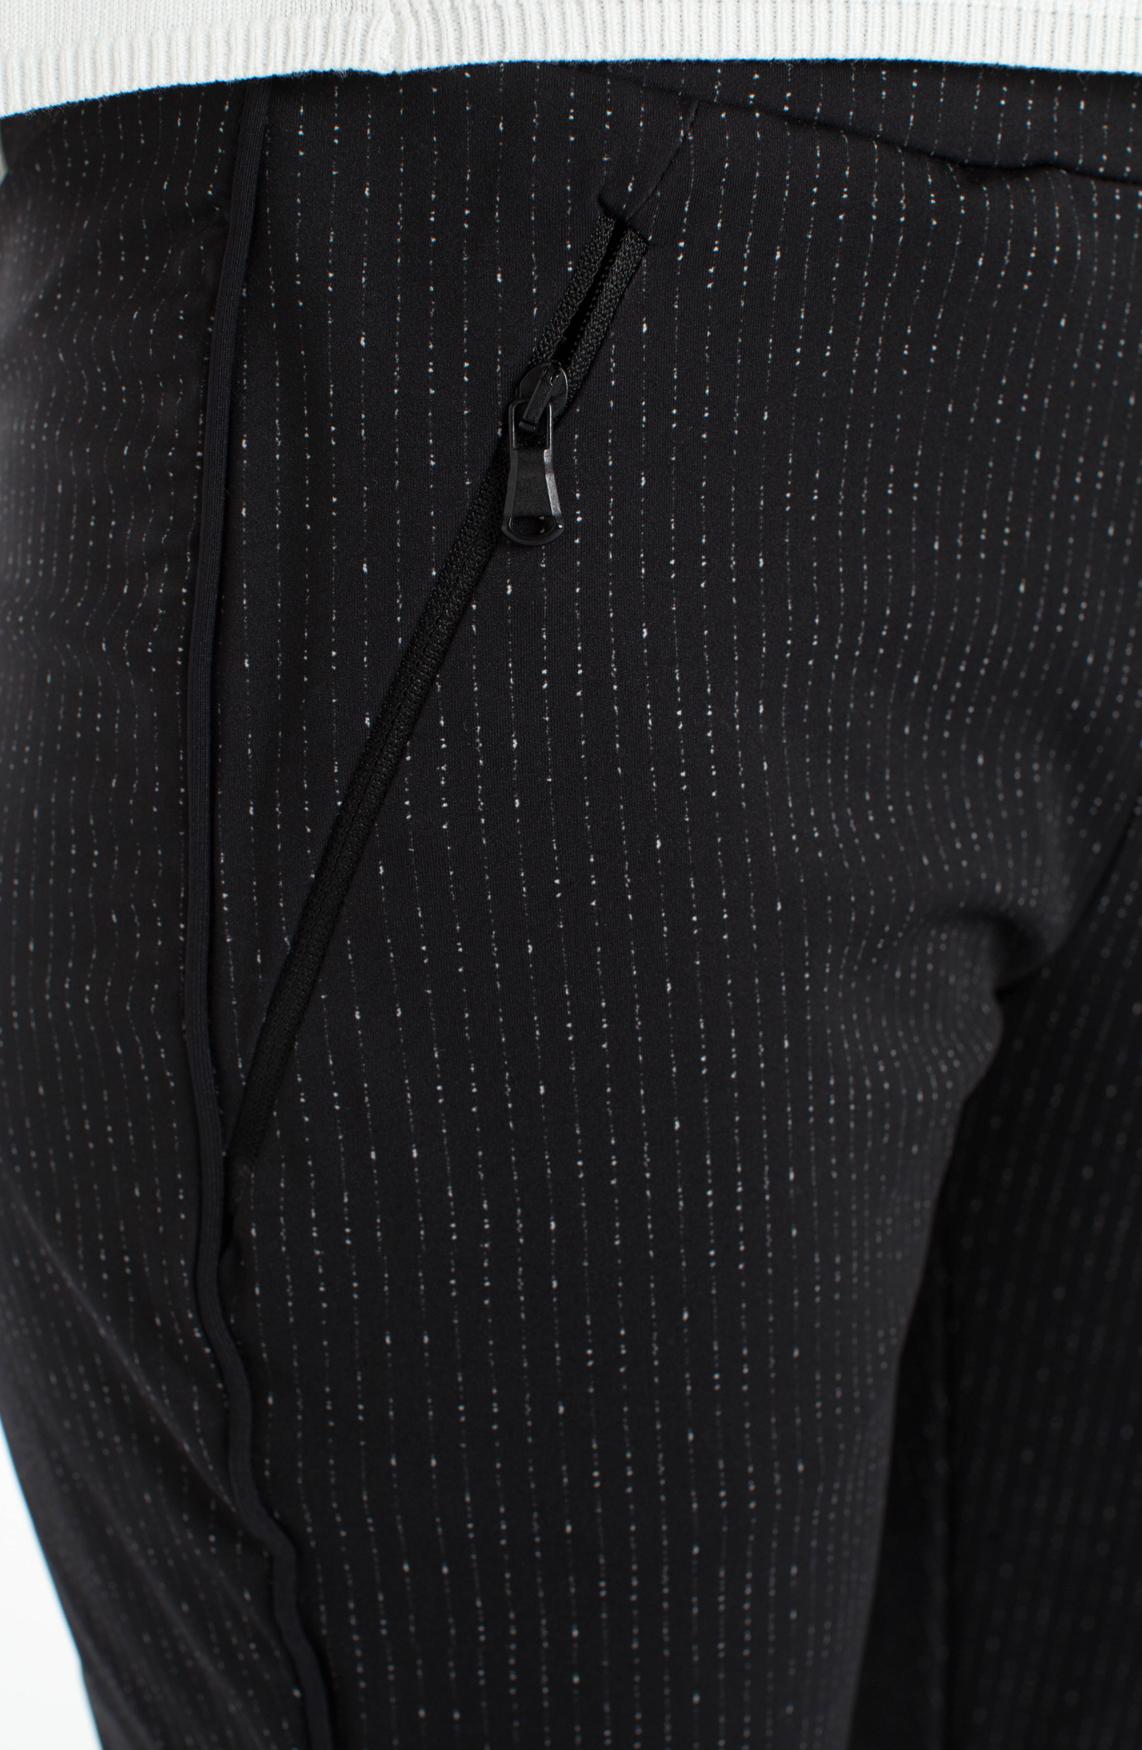 Anna Dames Jogpantalon met krijtstrepen zwart